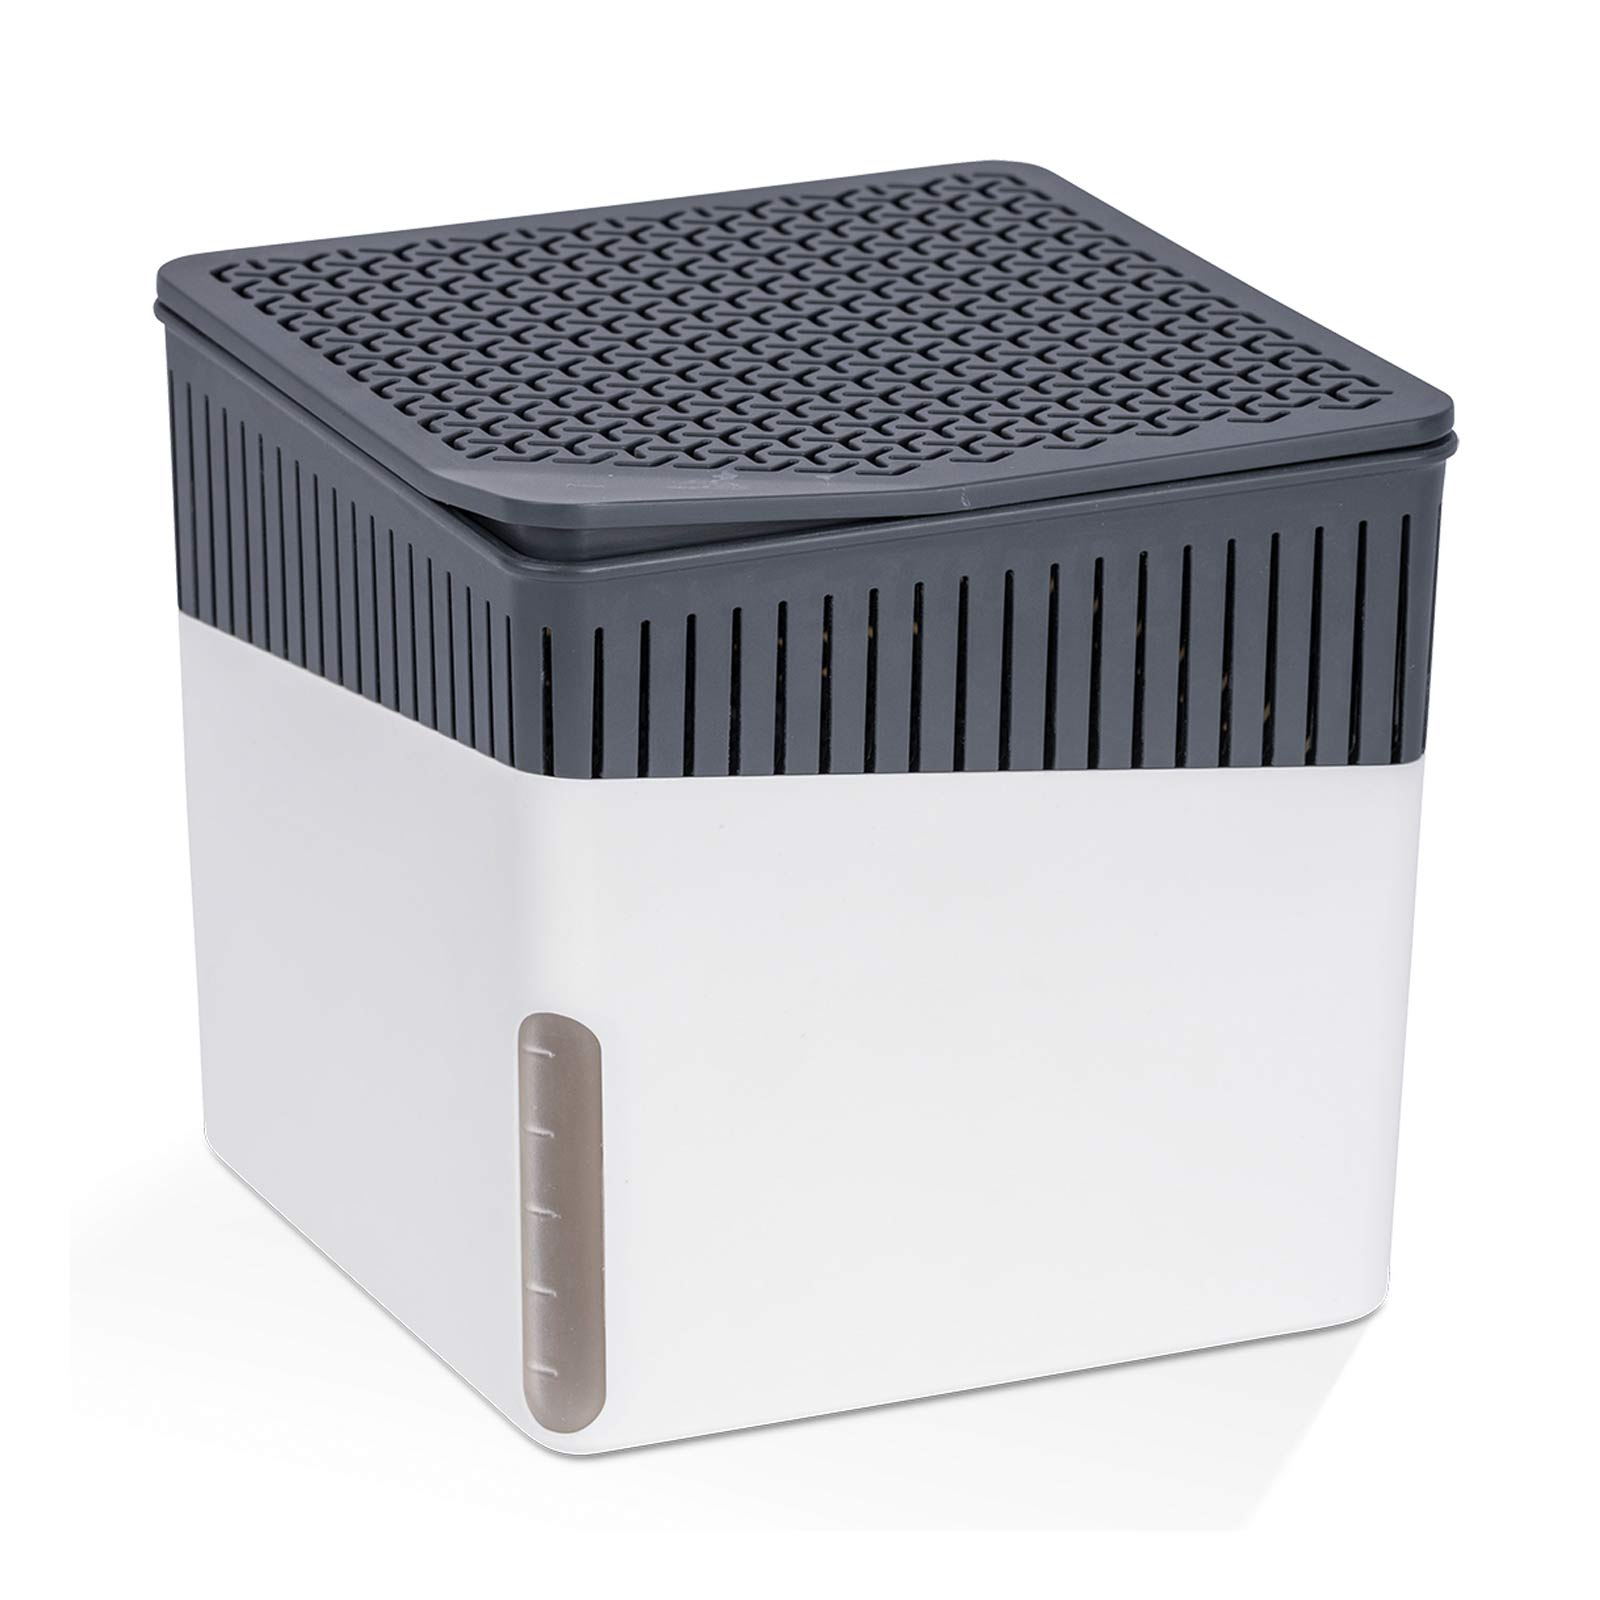 kleiner luftentfeuchter 500g cube ohne strom f r r ume bis 40 m purenature. Black Bedroom Furniture Sets. Home Design Ideas